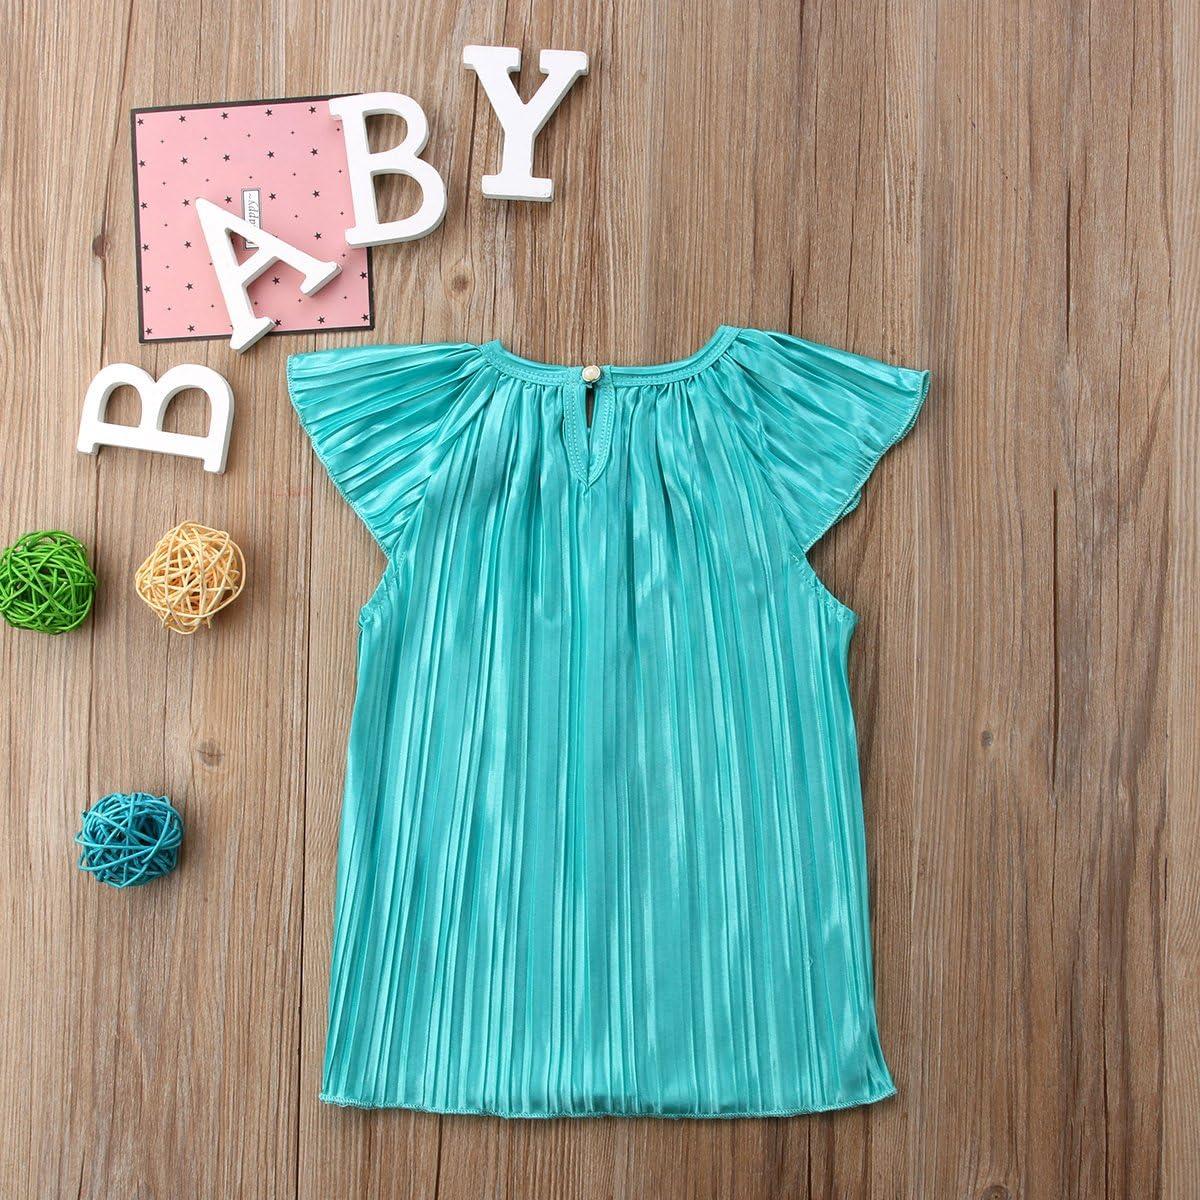 Binwwede Baby Girl Pleated Skirt Loose Sleeve Elastic Neckline Straight Dress